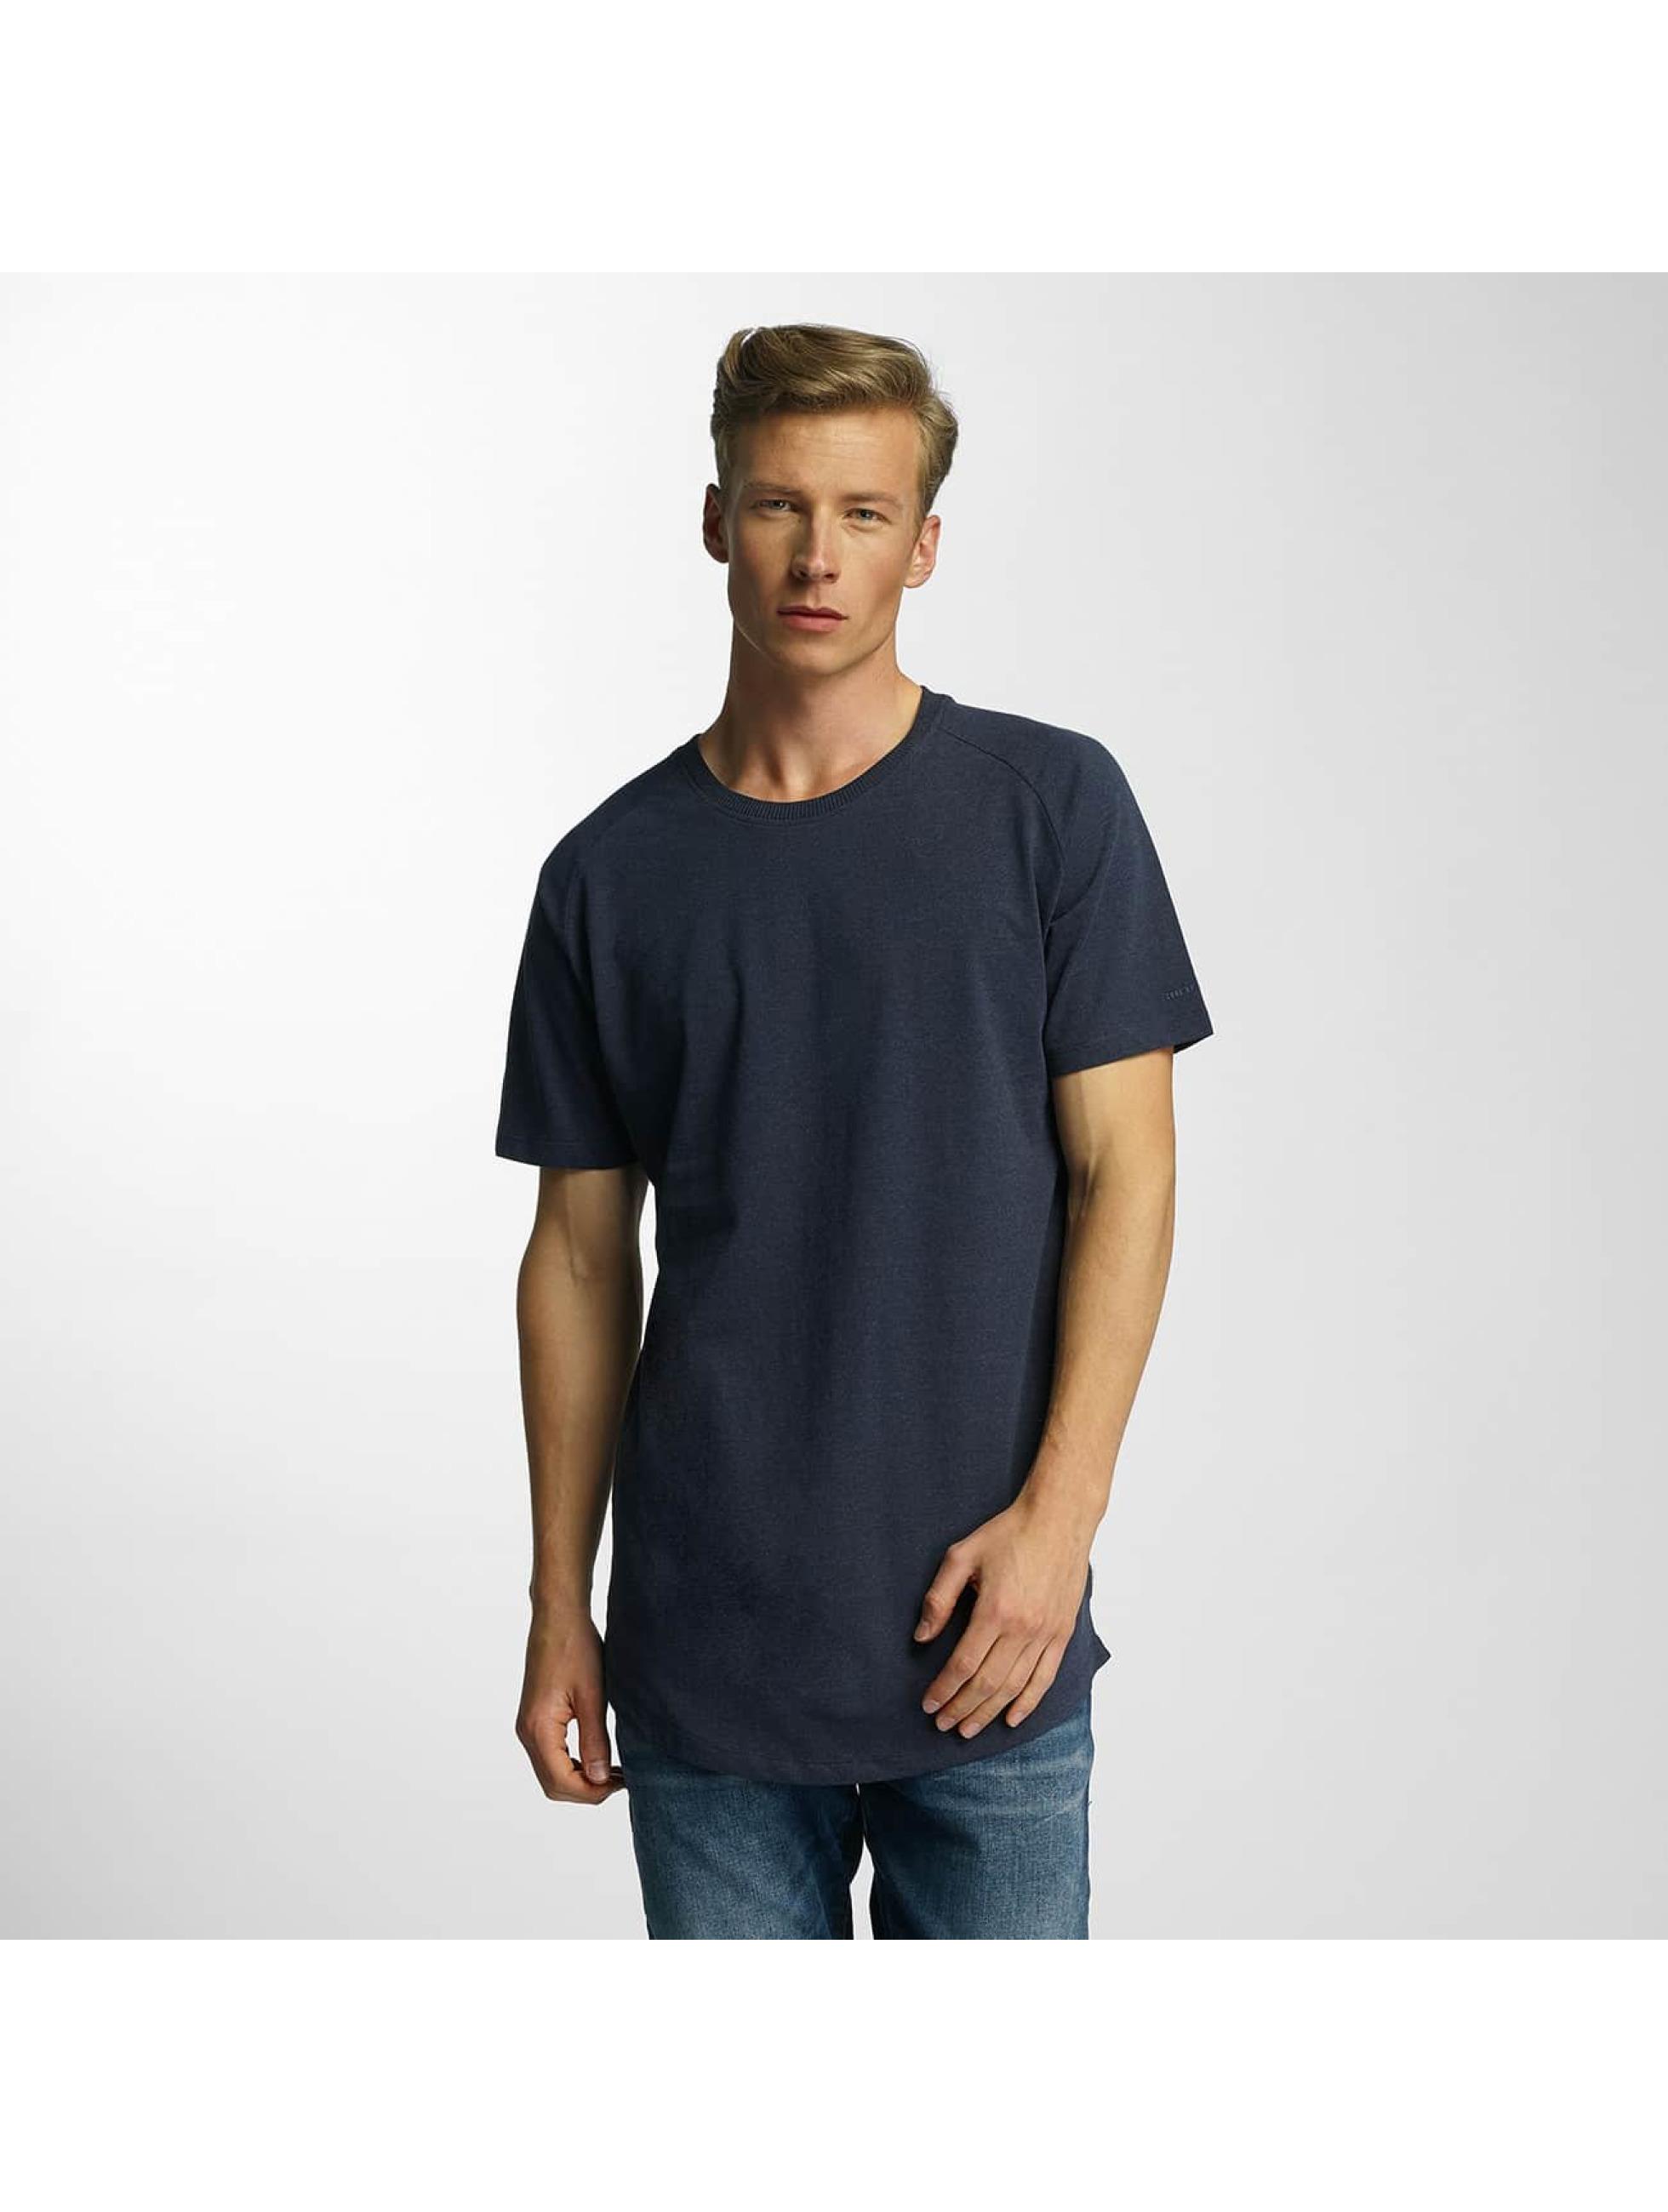 Jack-amp-Jones-Uomini-Maglieria-T-shirt-jcoRafe